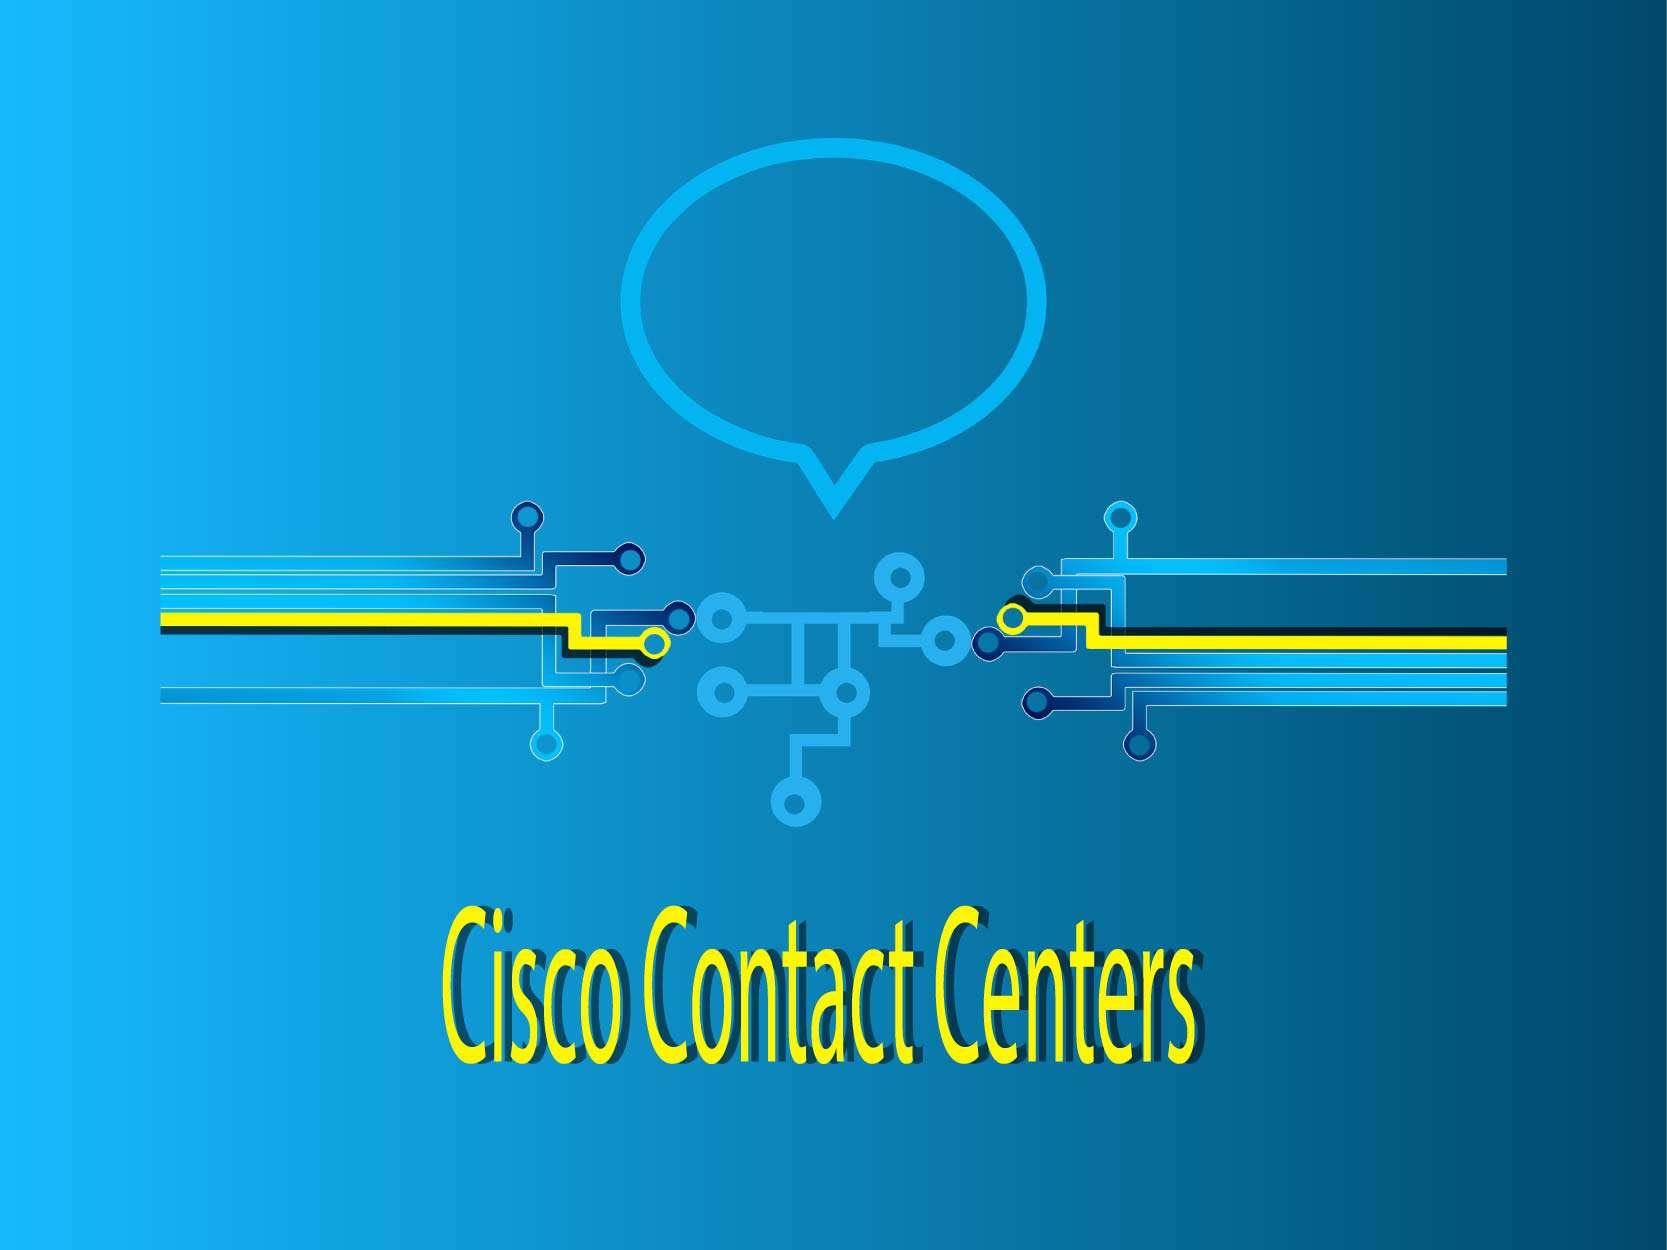 Cisco Contact Centers